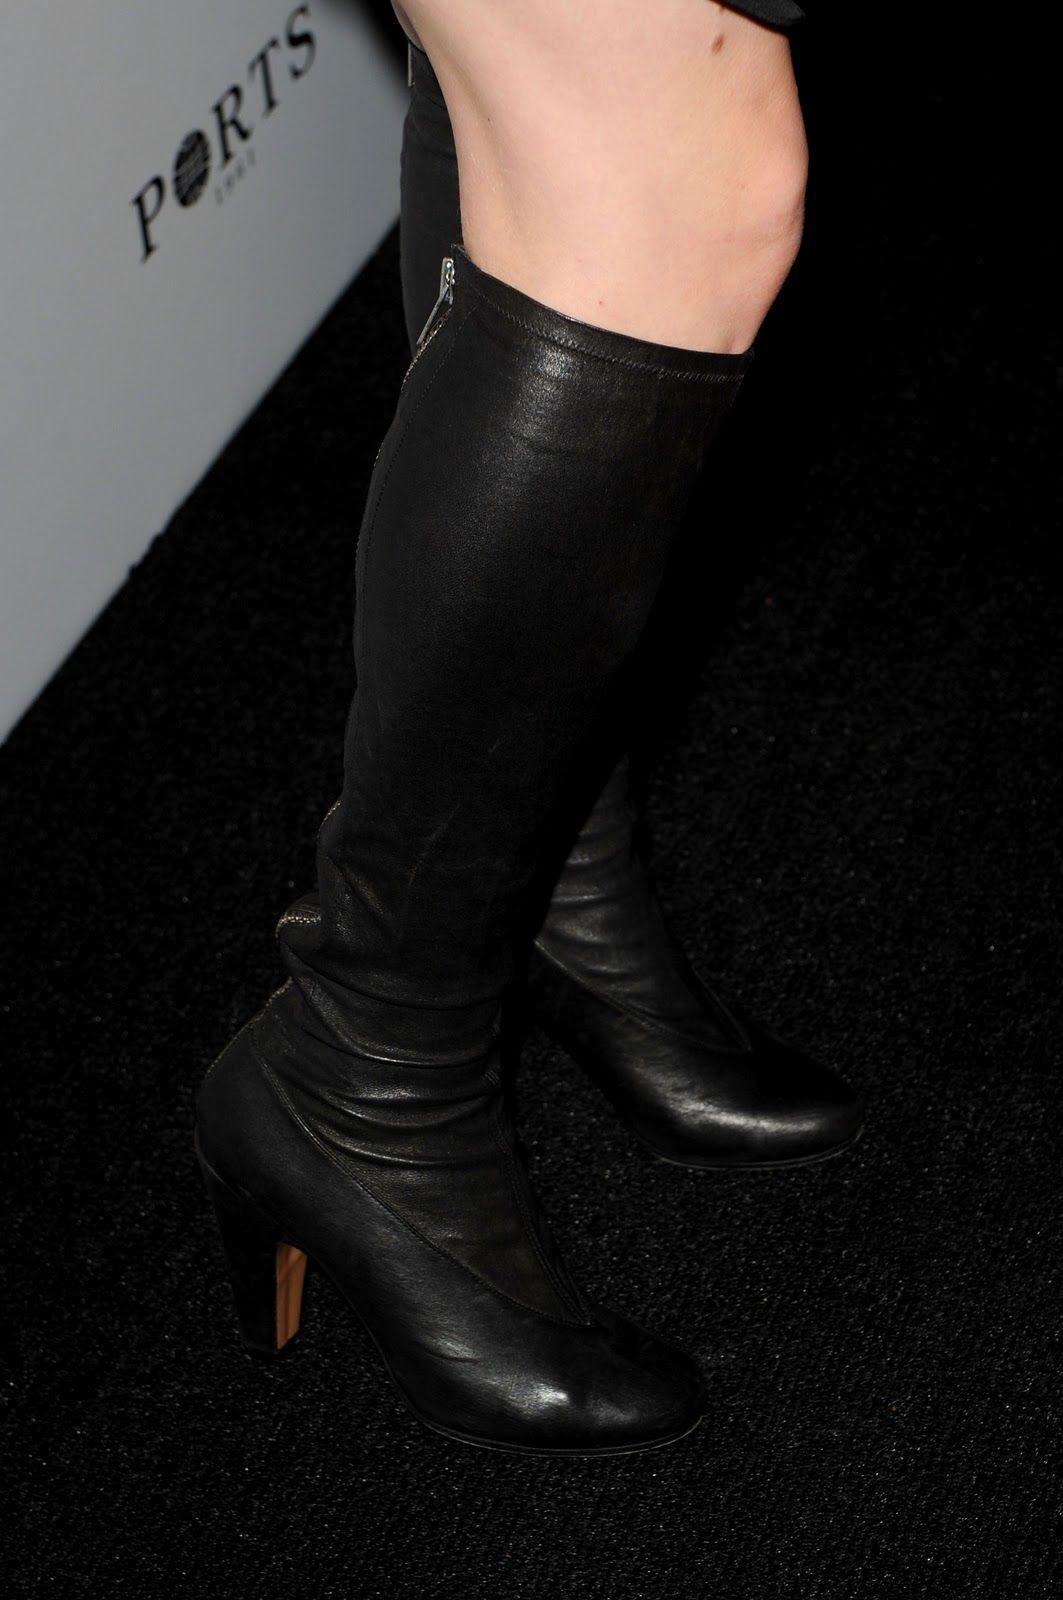 new product 799d5 0a8db Pin de Belen Vazquez en BOOTS SHOES AND SNEAKERS   Shoe boots, Boots y Shoes